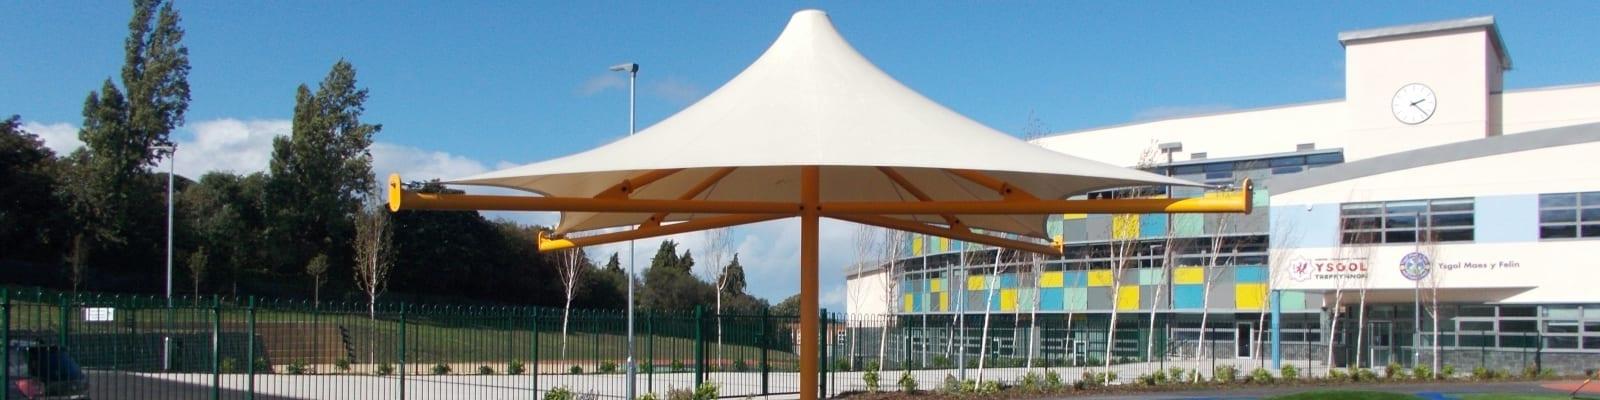 Holywell Learning Campus Umbrella Shelter